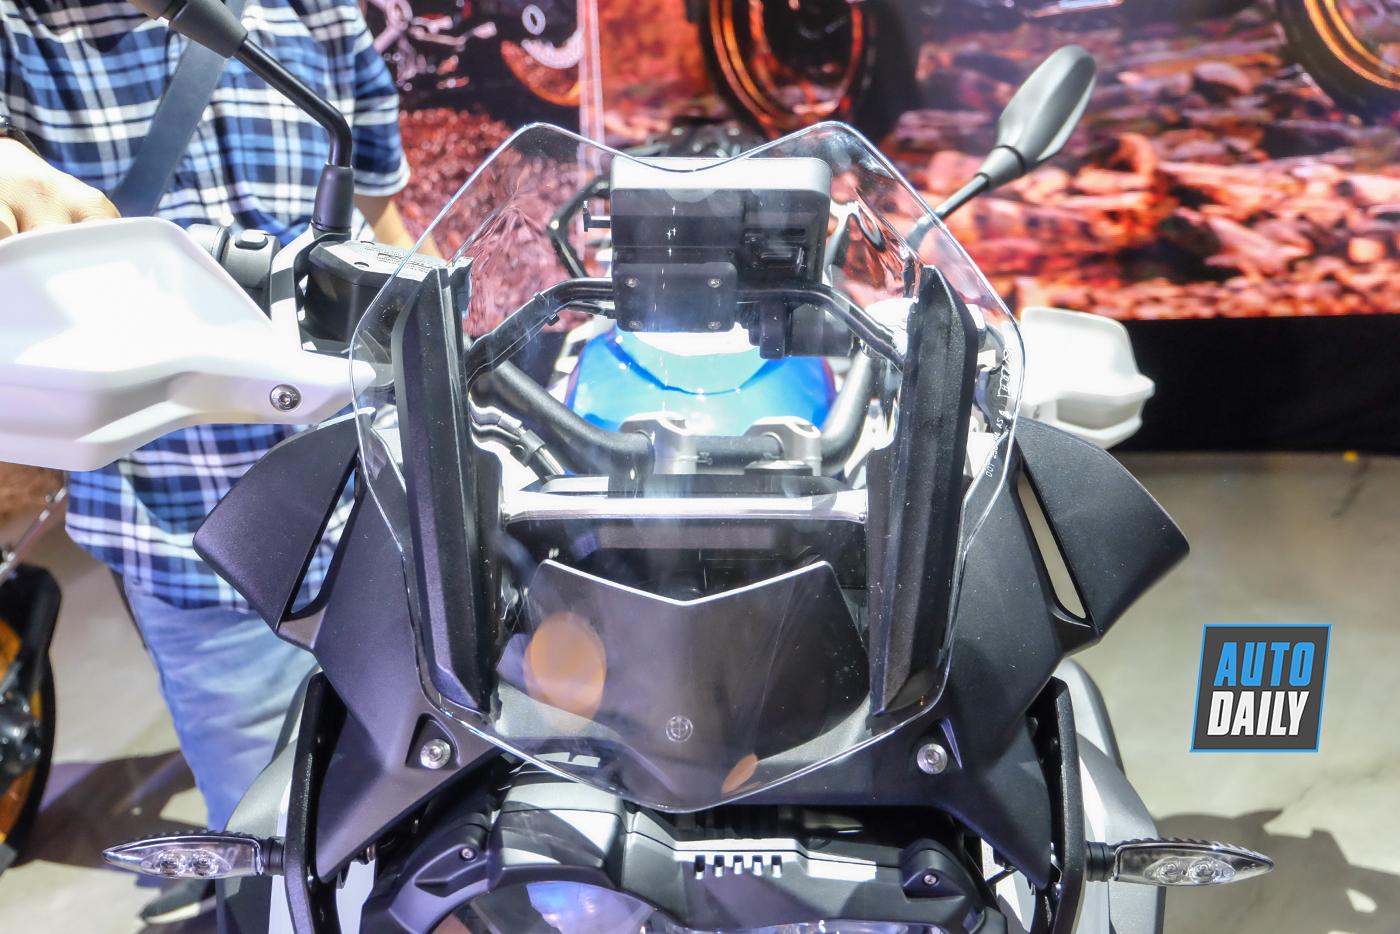 bmw-motorrad-r-1250-gs-2019-1.jpg